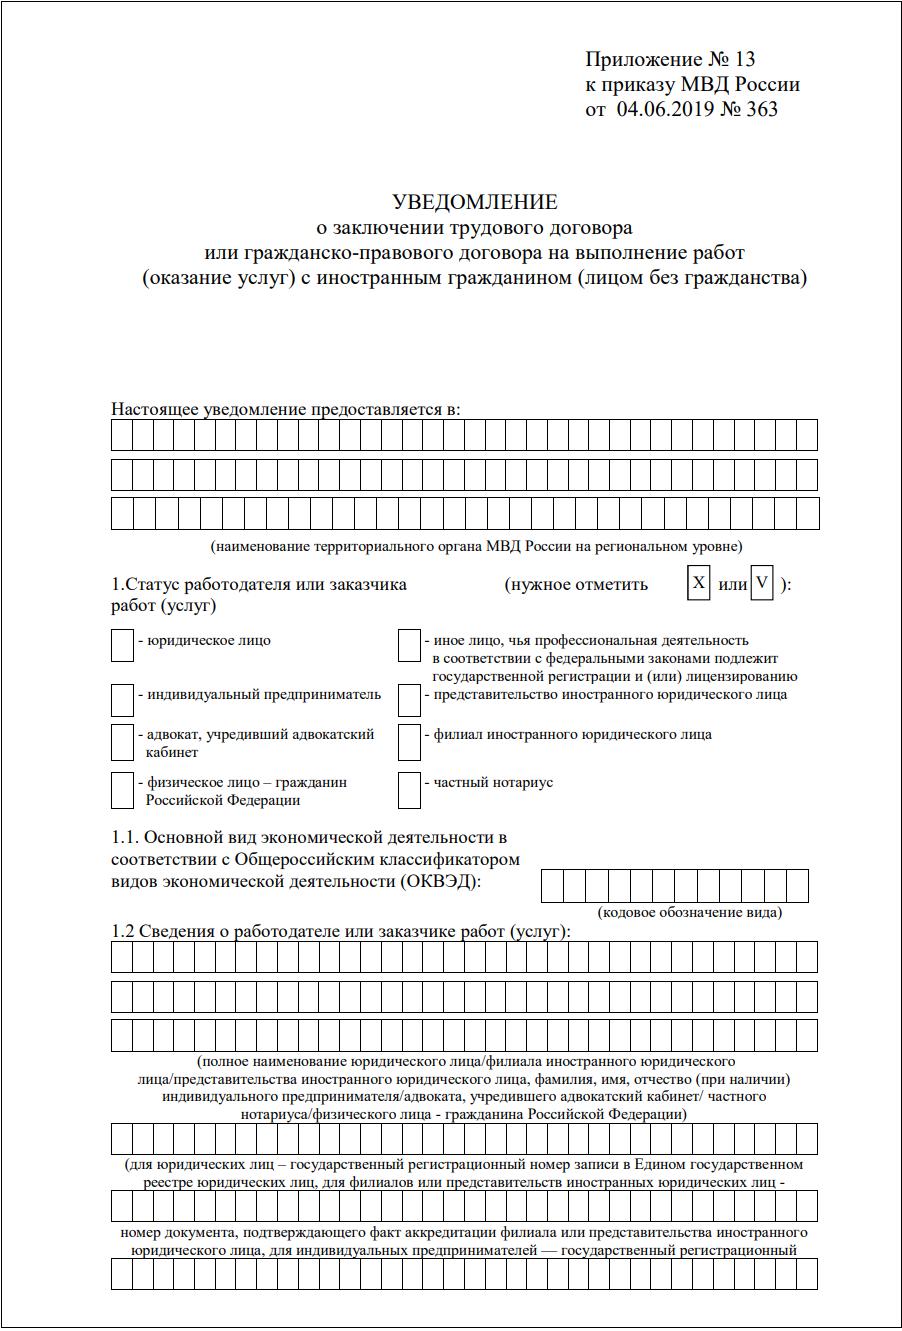 Уведомление по приказу от 04.06.2019 № 363